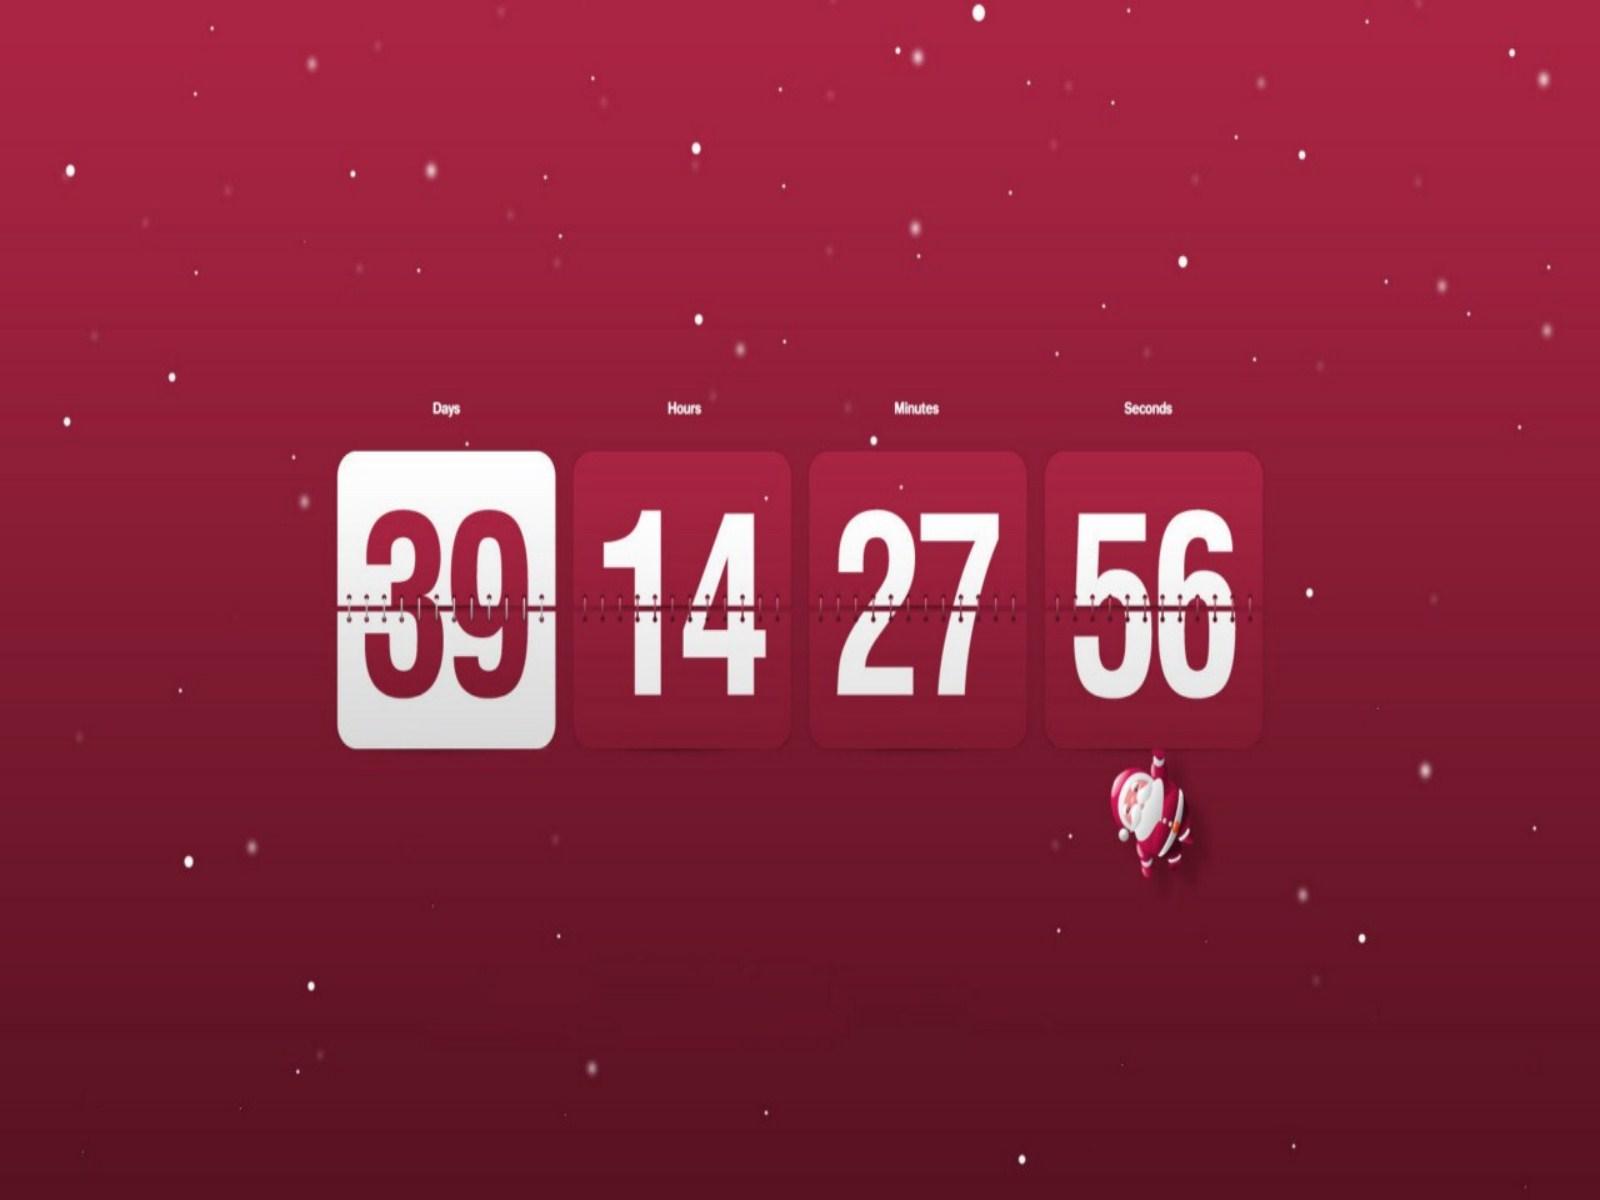 Birthday Countdown Wallpaper